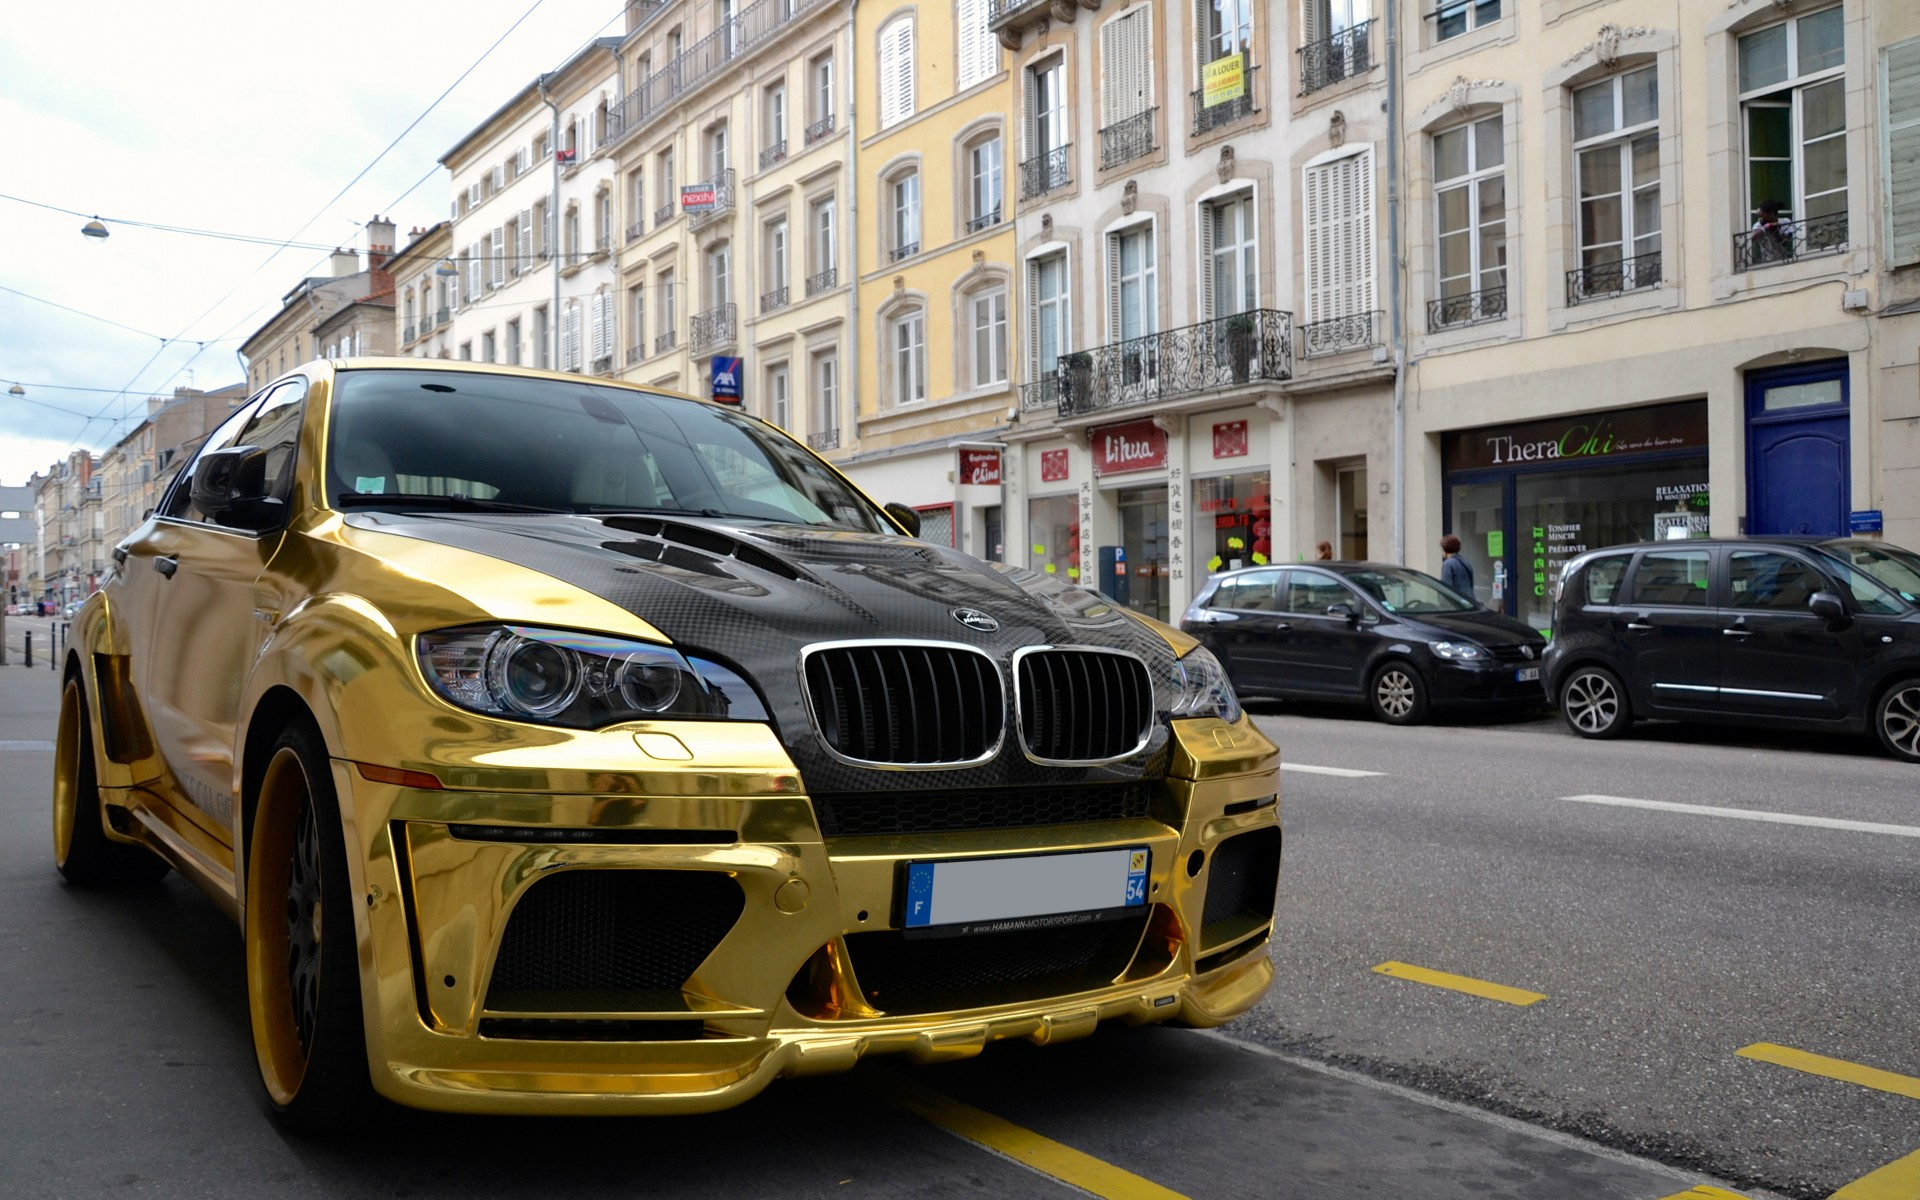 Bmw X6 M Hamann Tycoon Evo M Gold Tuning Wallpaper